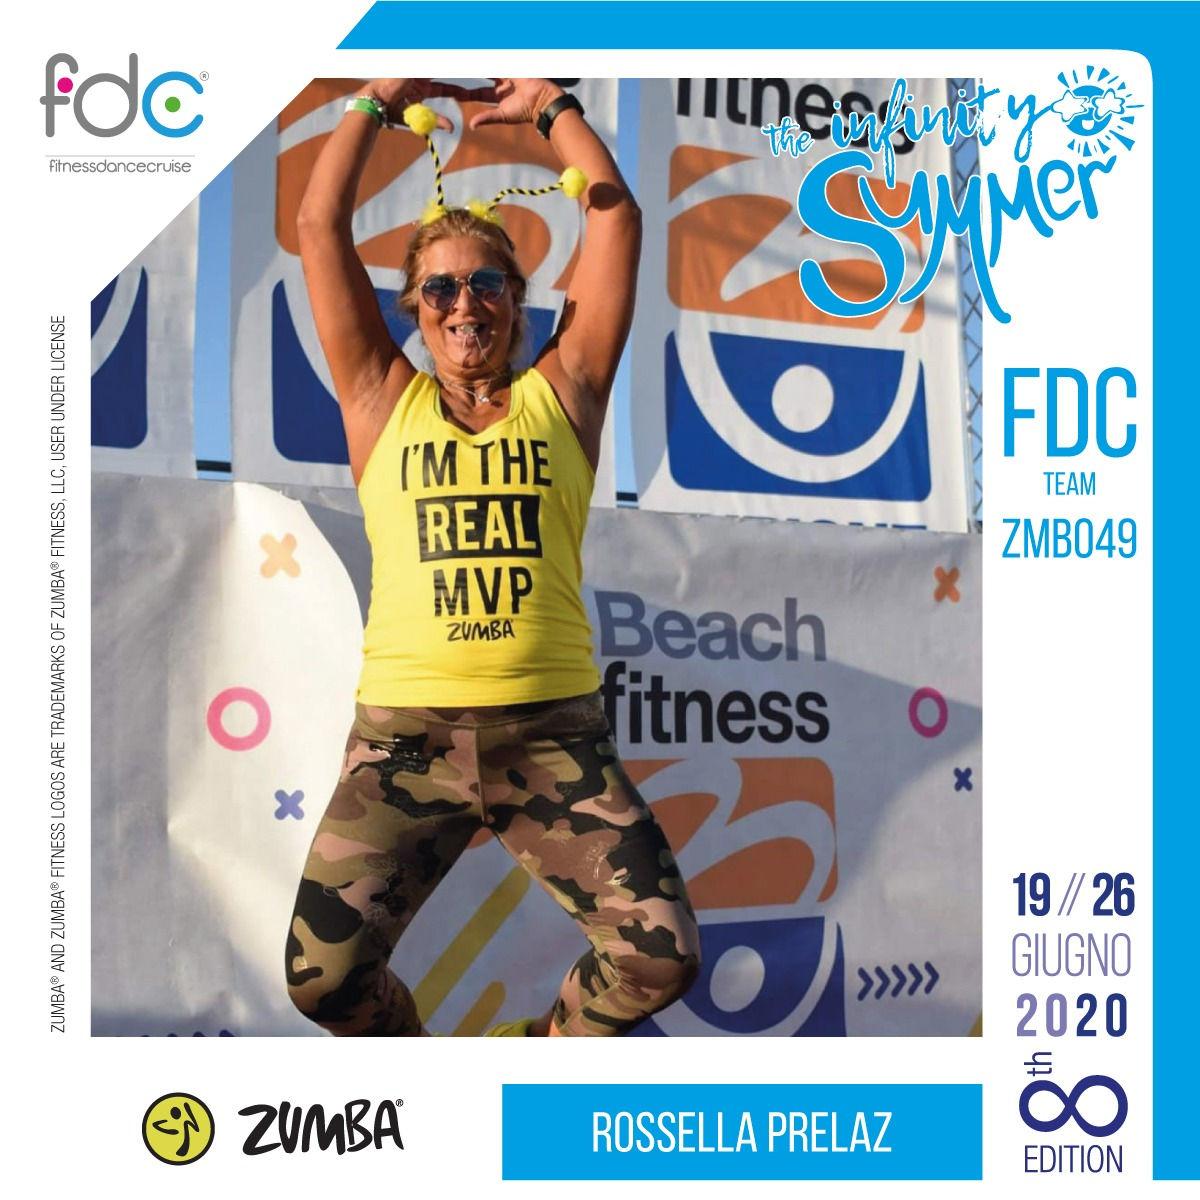 FDC Team Rossella Prelaz